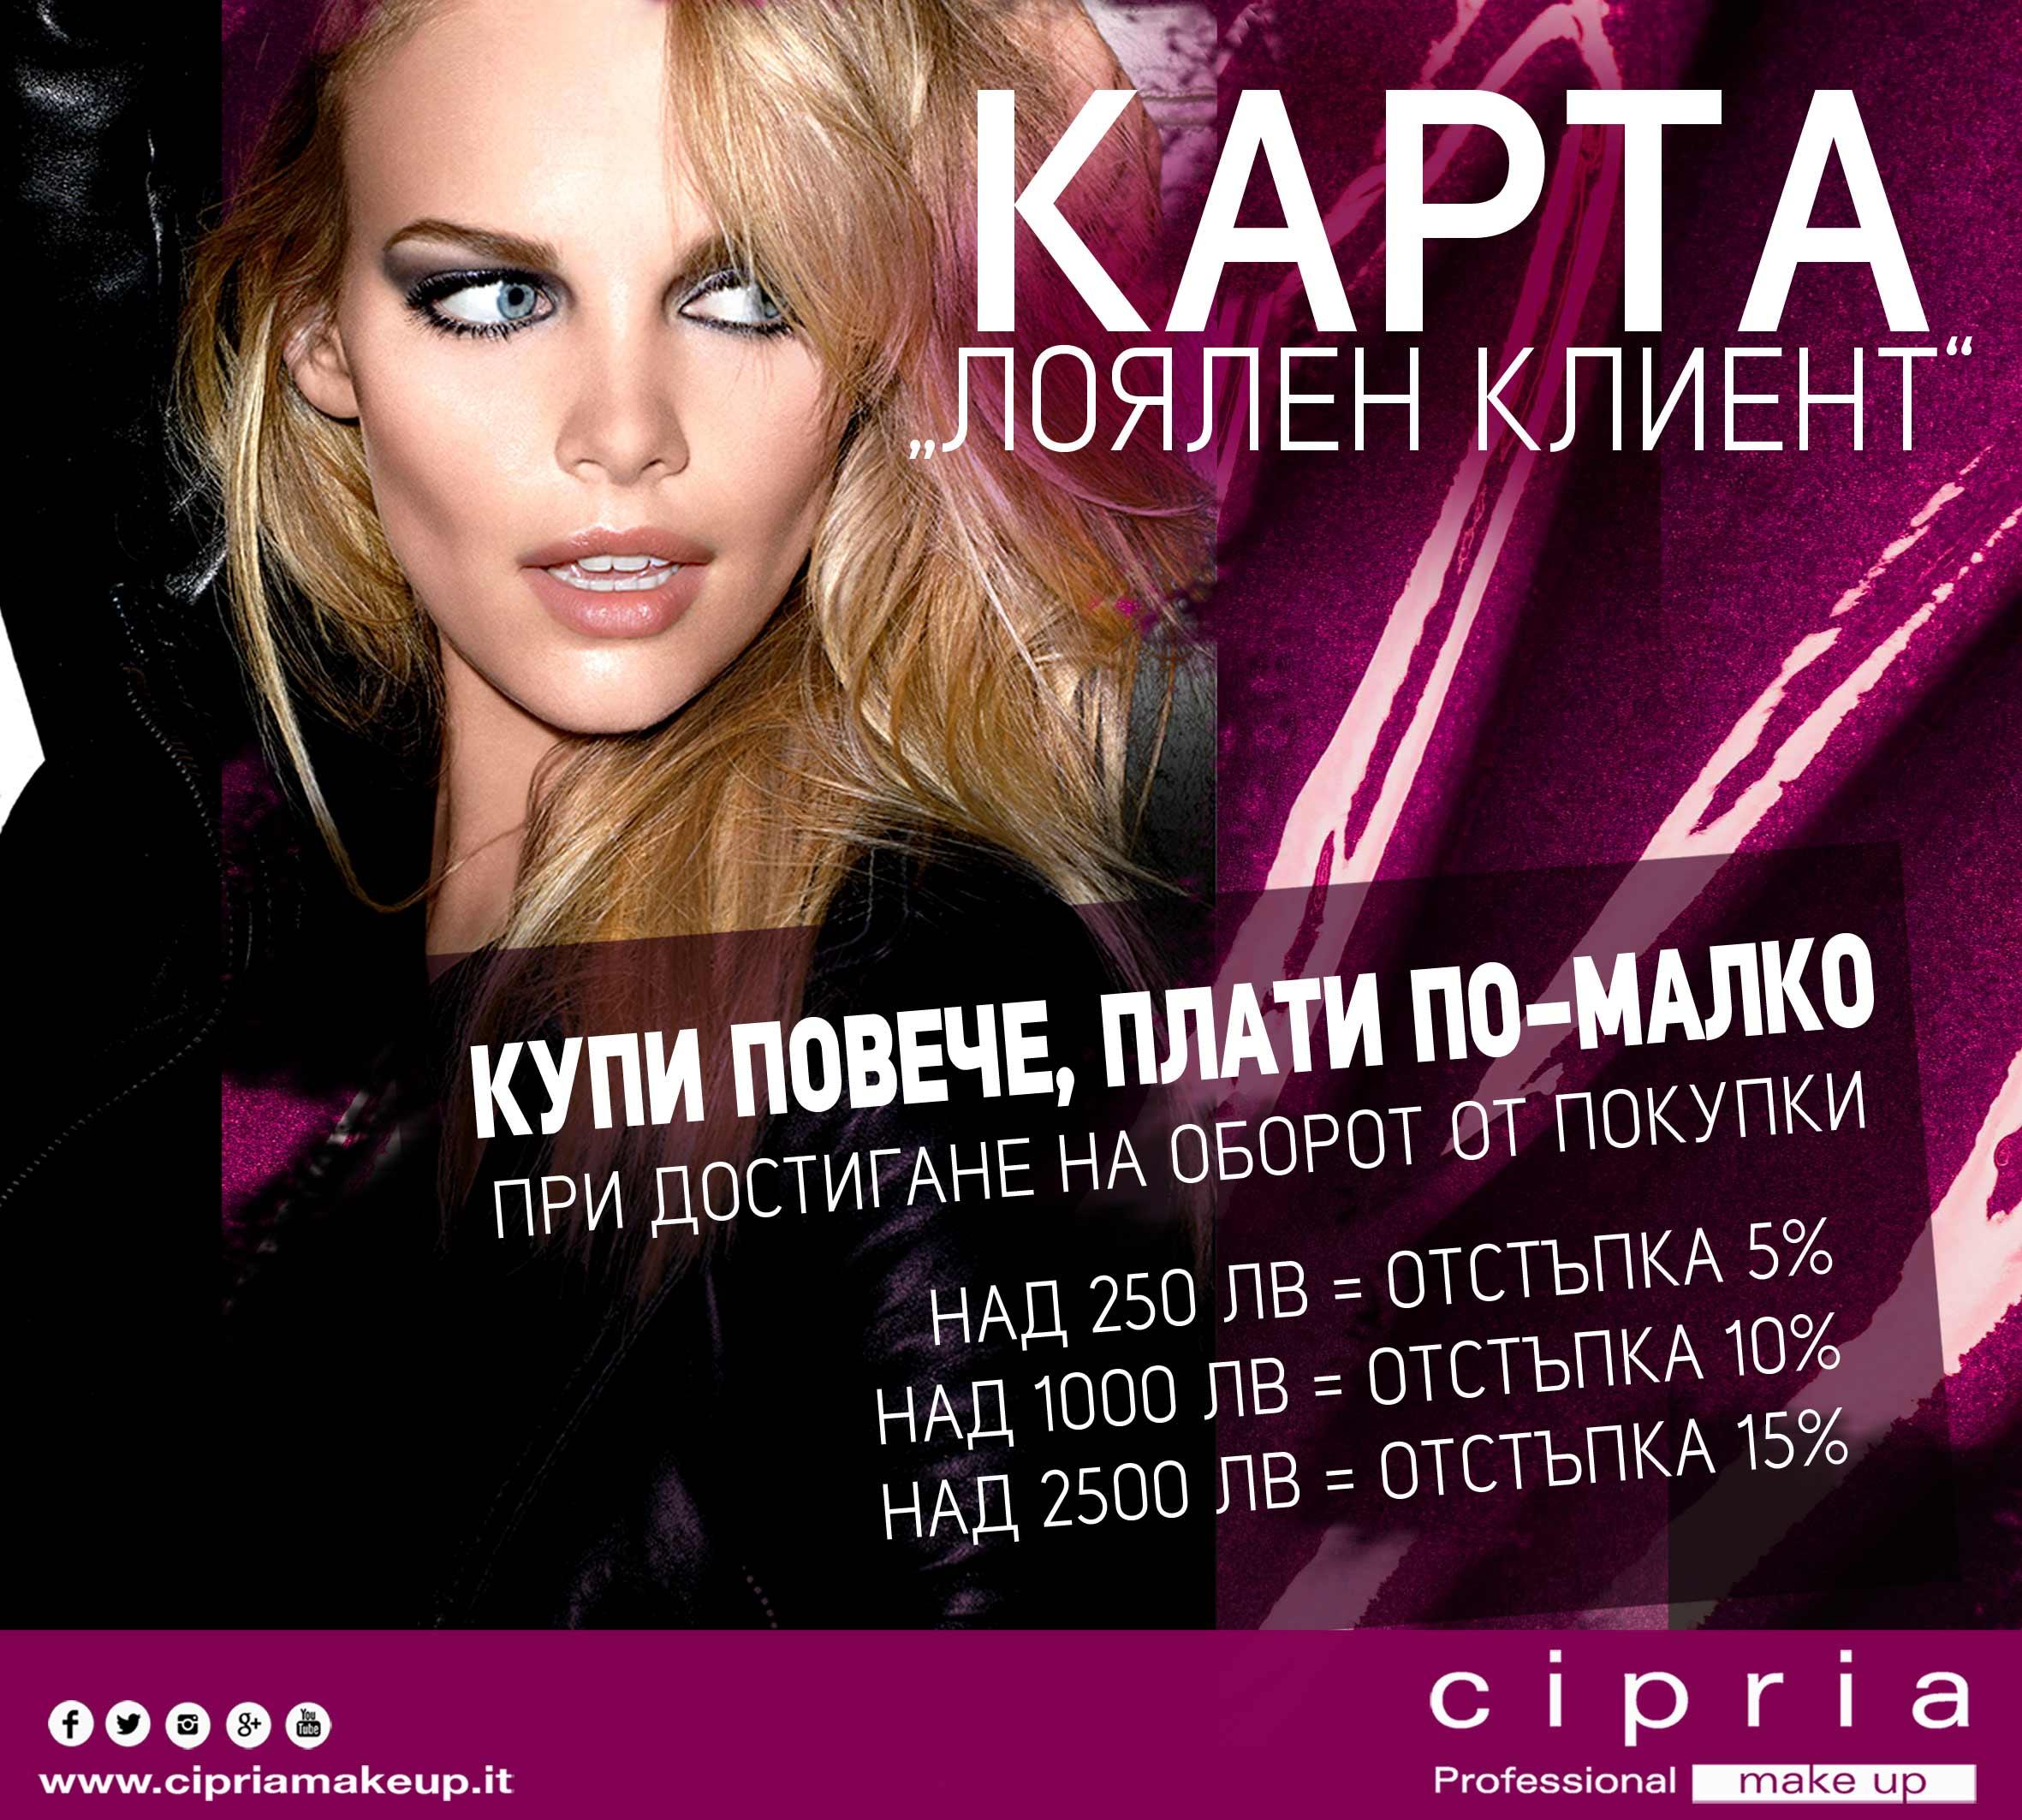 Карта за лоялни клиенти на CIPRIA Professional Make Up